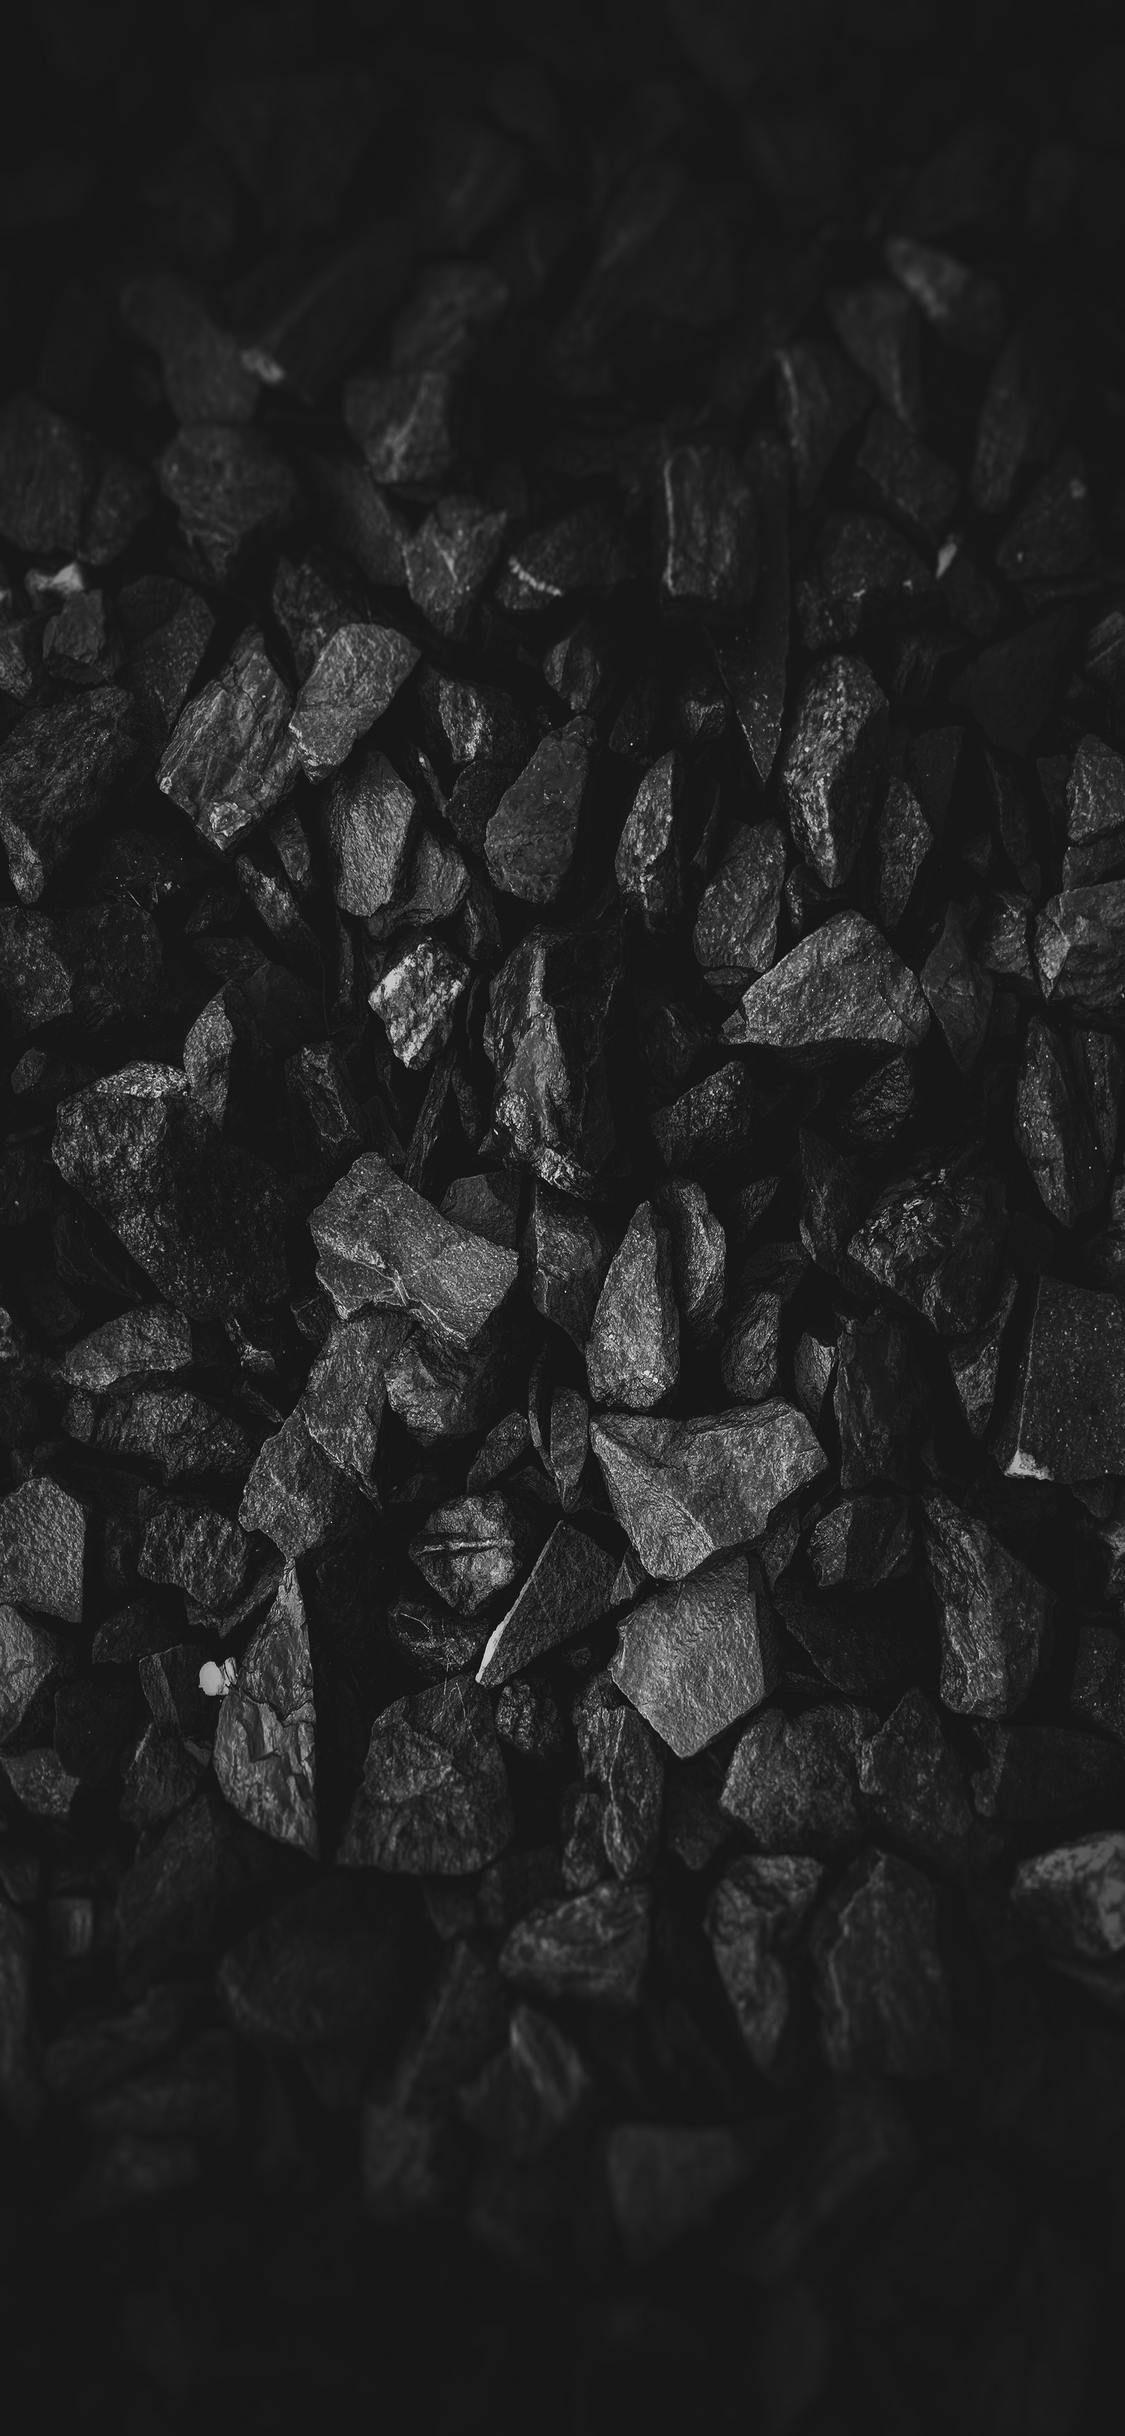 Black Wallpaper 4k Hd For Iphone In 2020 Black Wallpaper Black Picture Black Wallpaper Iphone